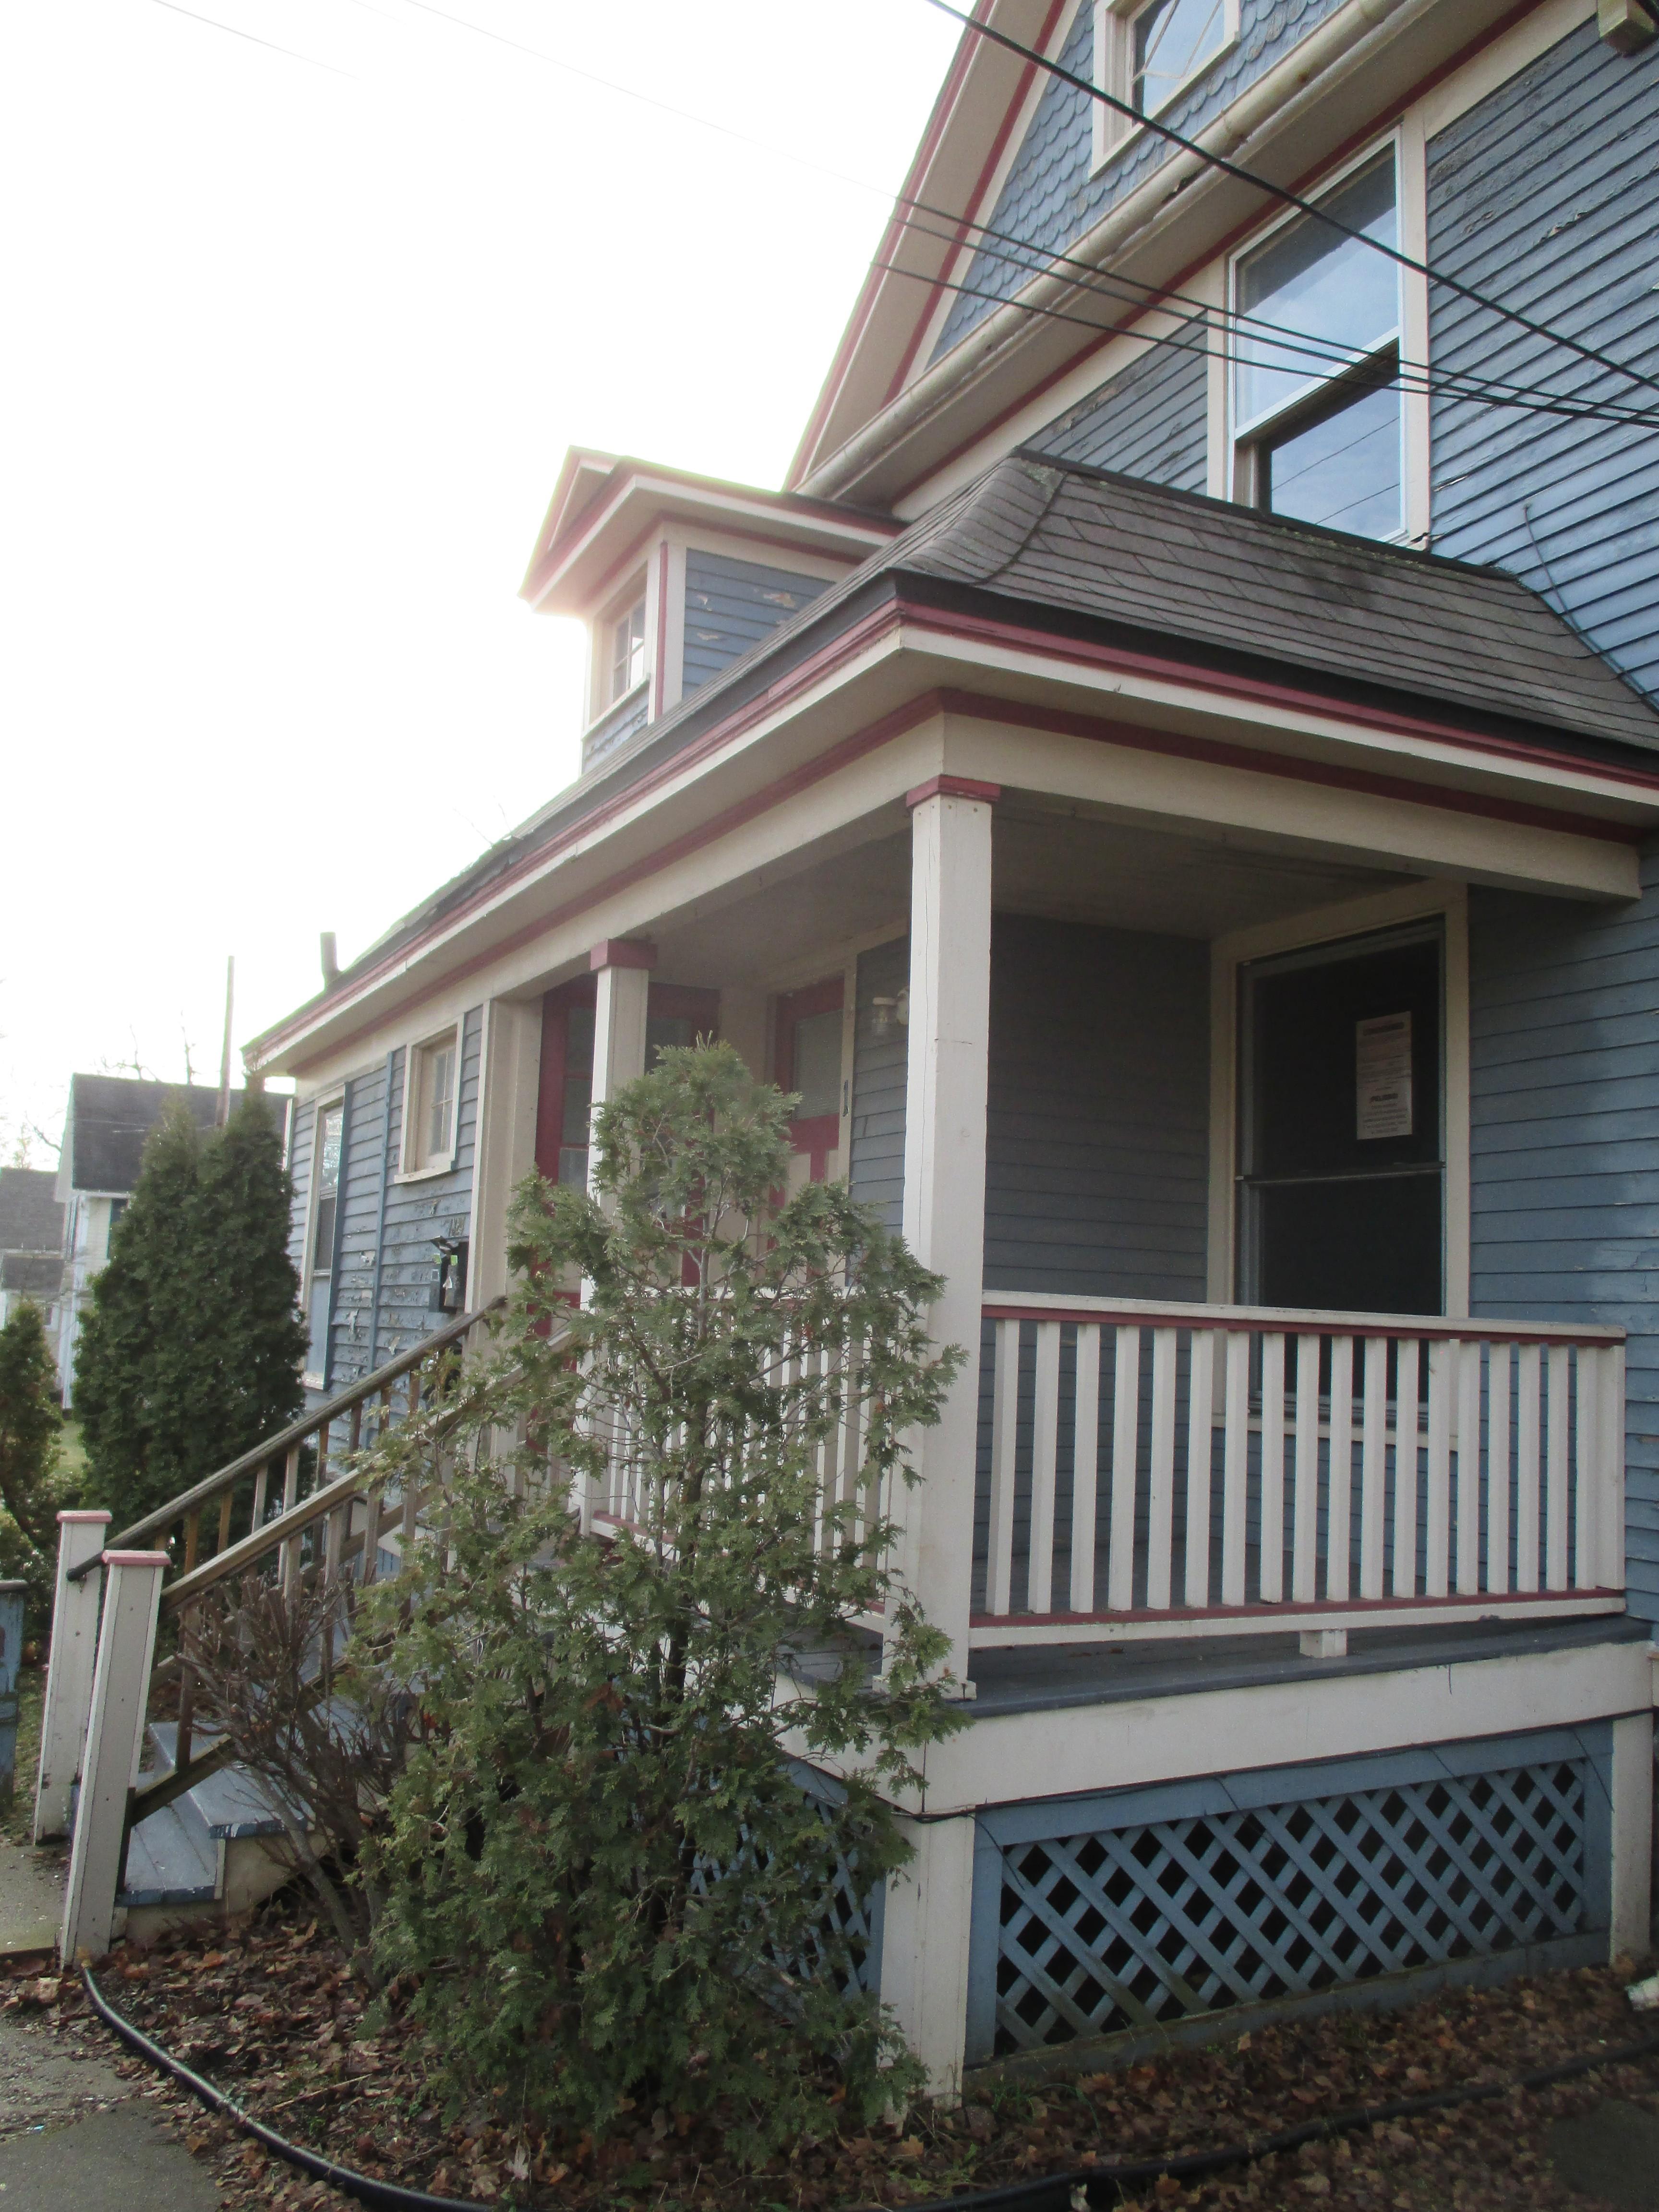 1324 S Westnedge Ave Apartments For Rent 1324 S Westnedge Ave Kalamazoo Mi 49008 Zumper